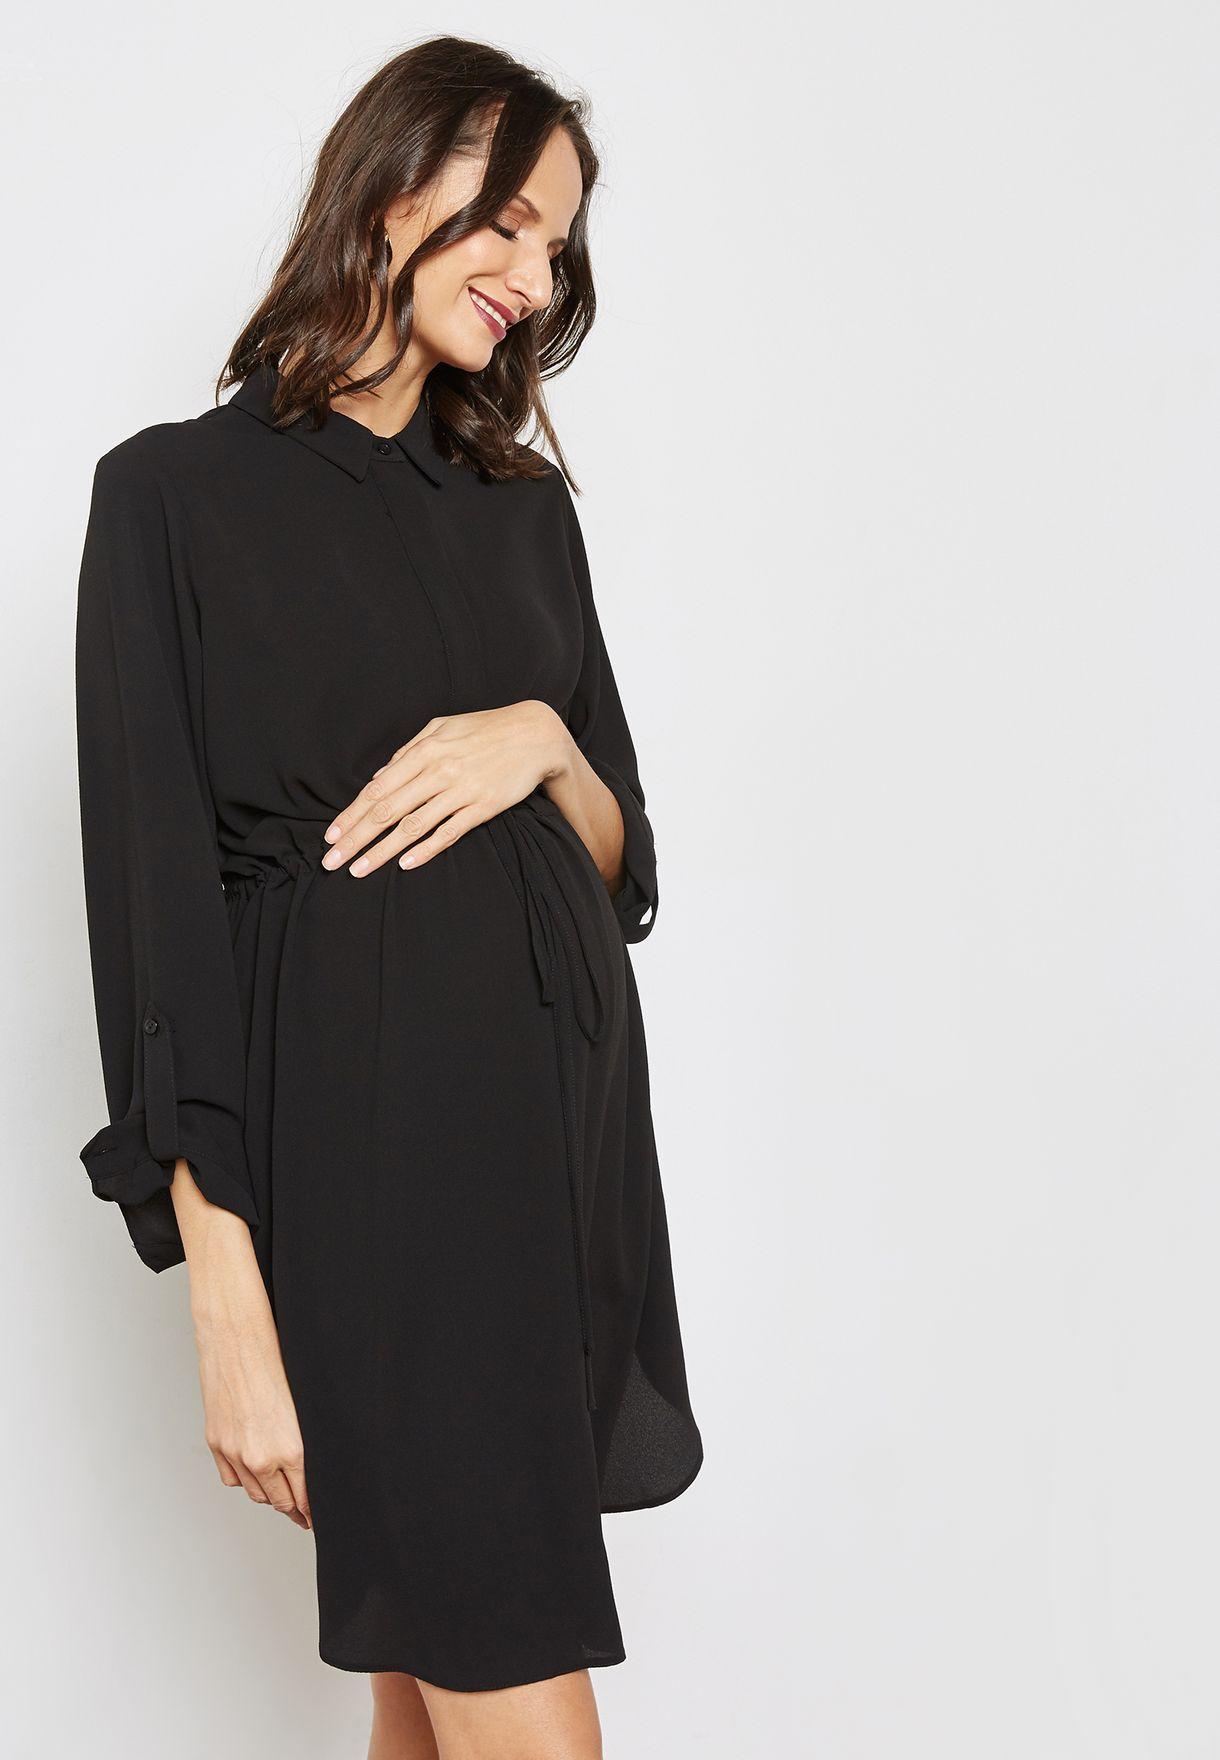 82ac30c04d6 Shop Dorothy Perkins Maternity black Roll Sleeve Shirt Dress ...